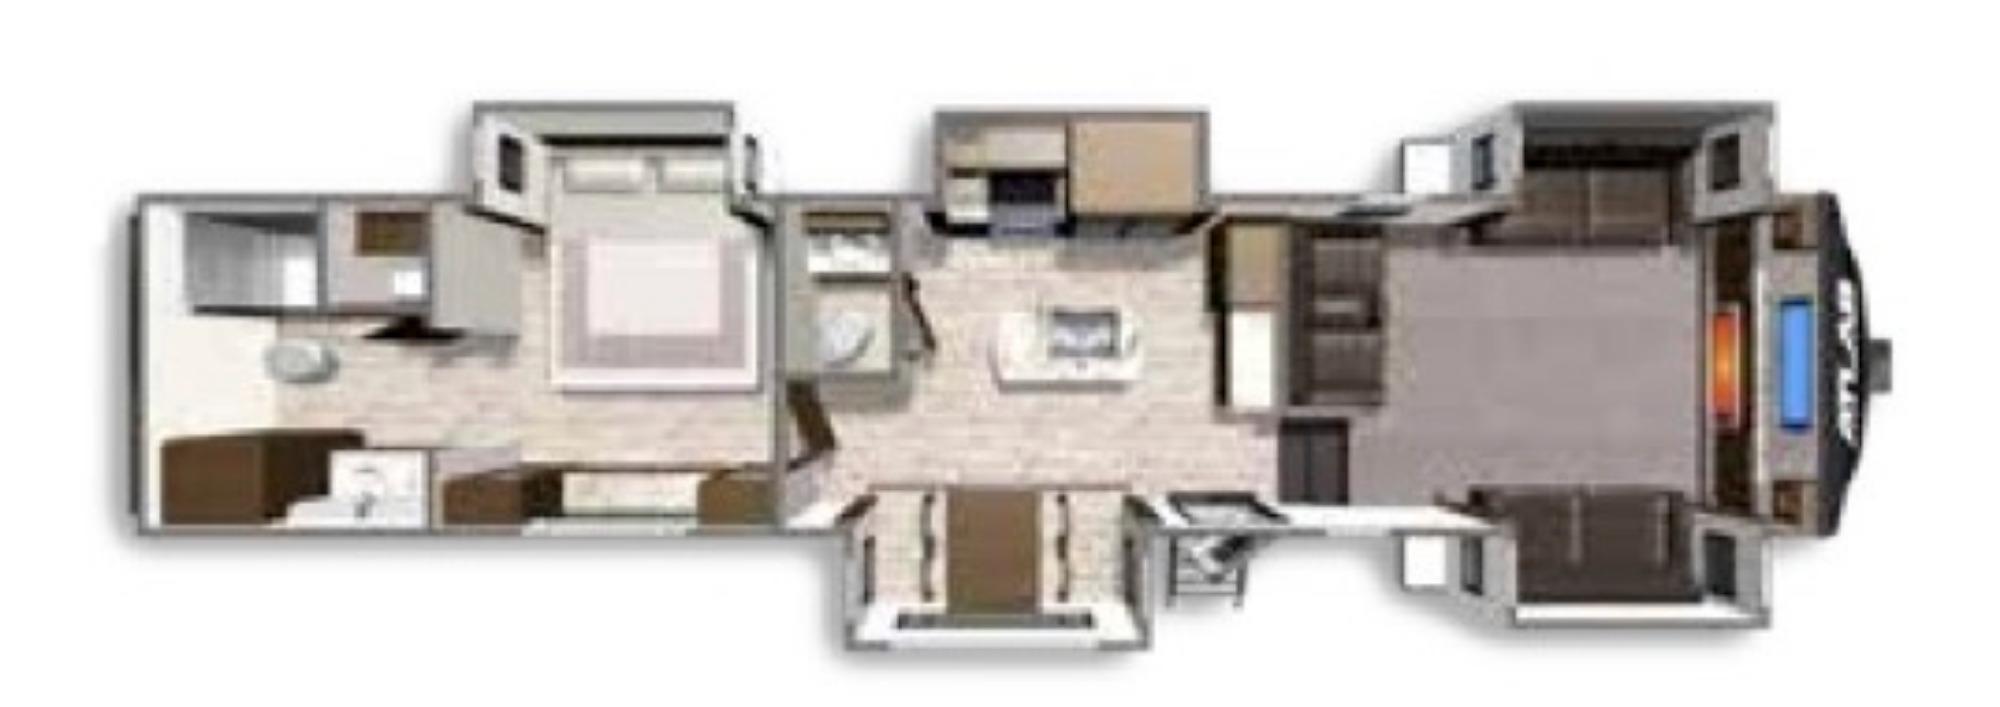 View Floor Plan for 2021 DUTCHMEN ATLAS 3802FLKB